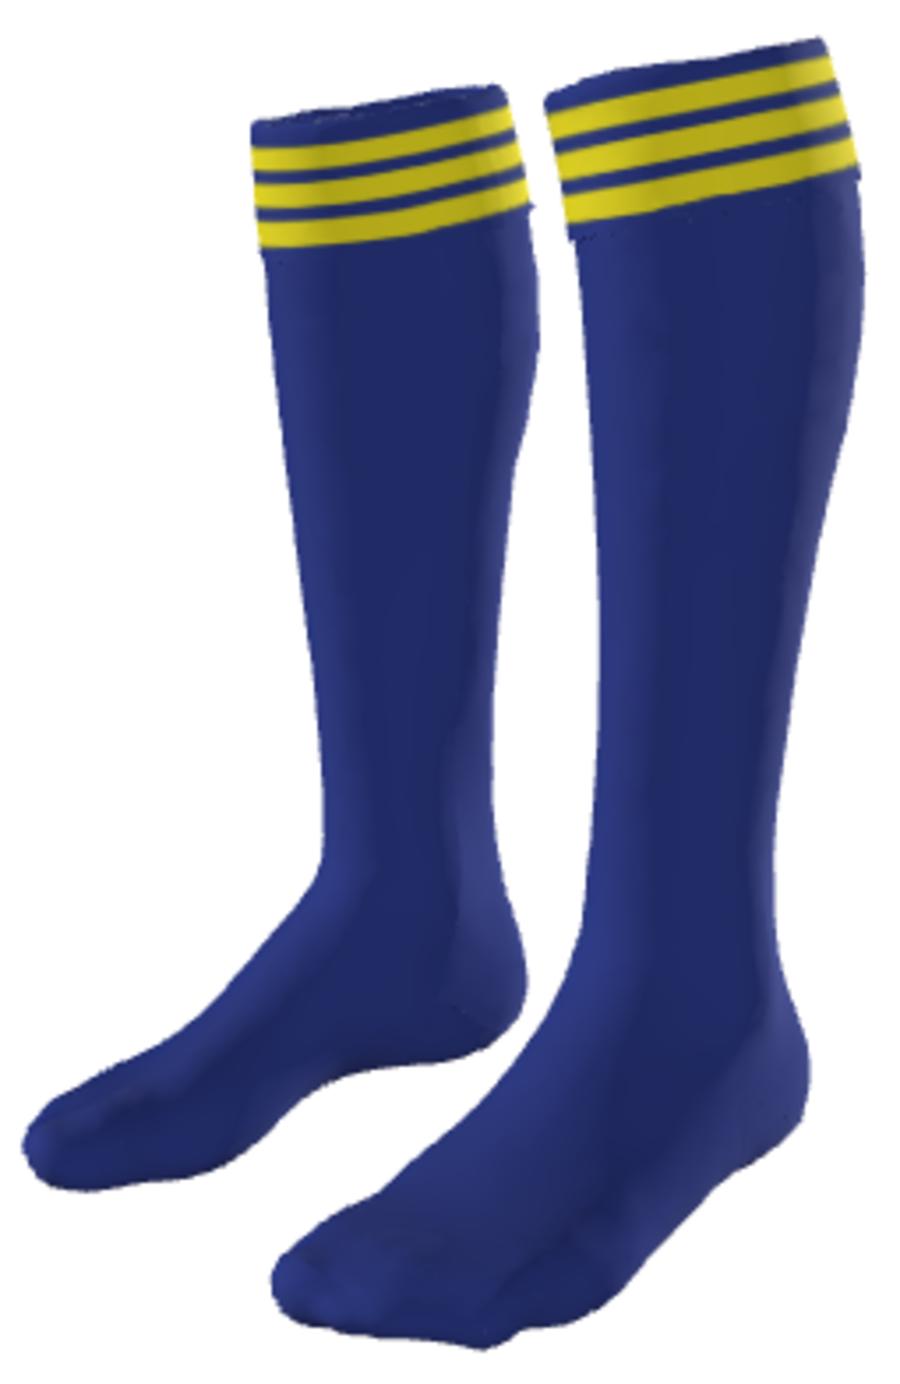 C2J. Willington FC Home Sock - Adult